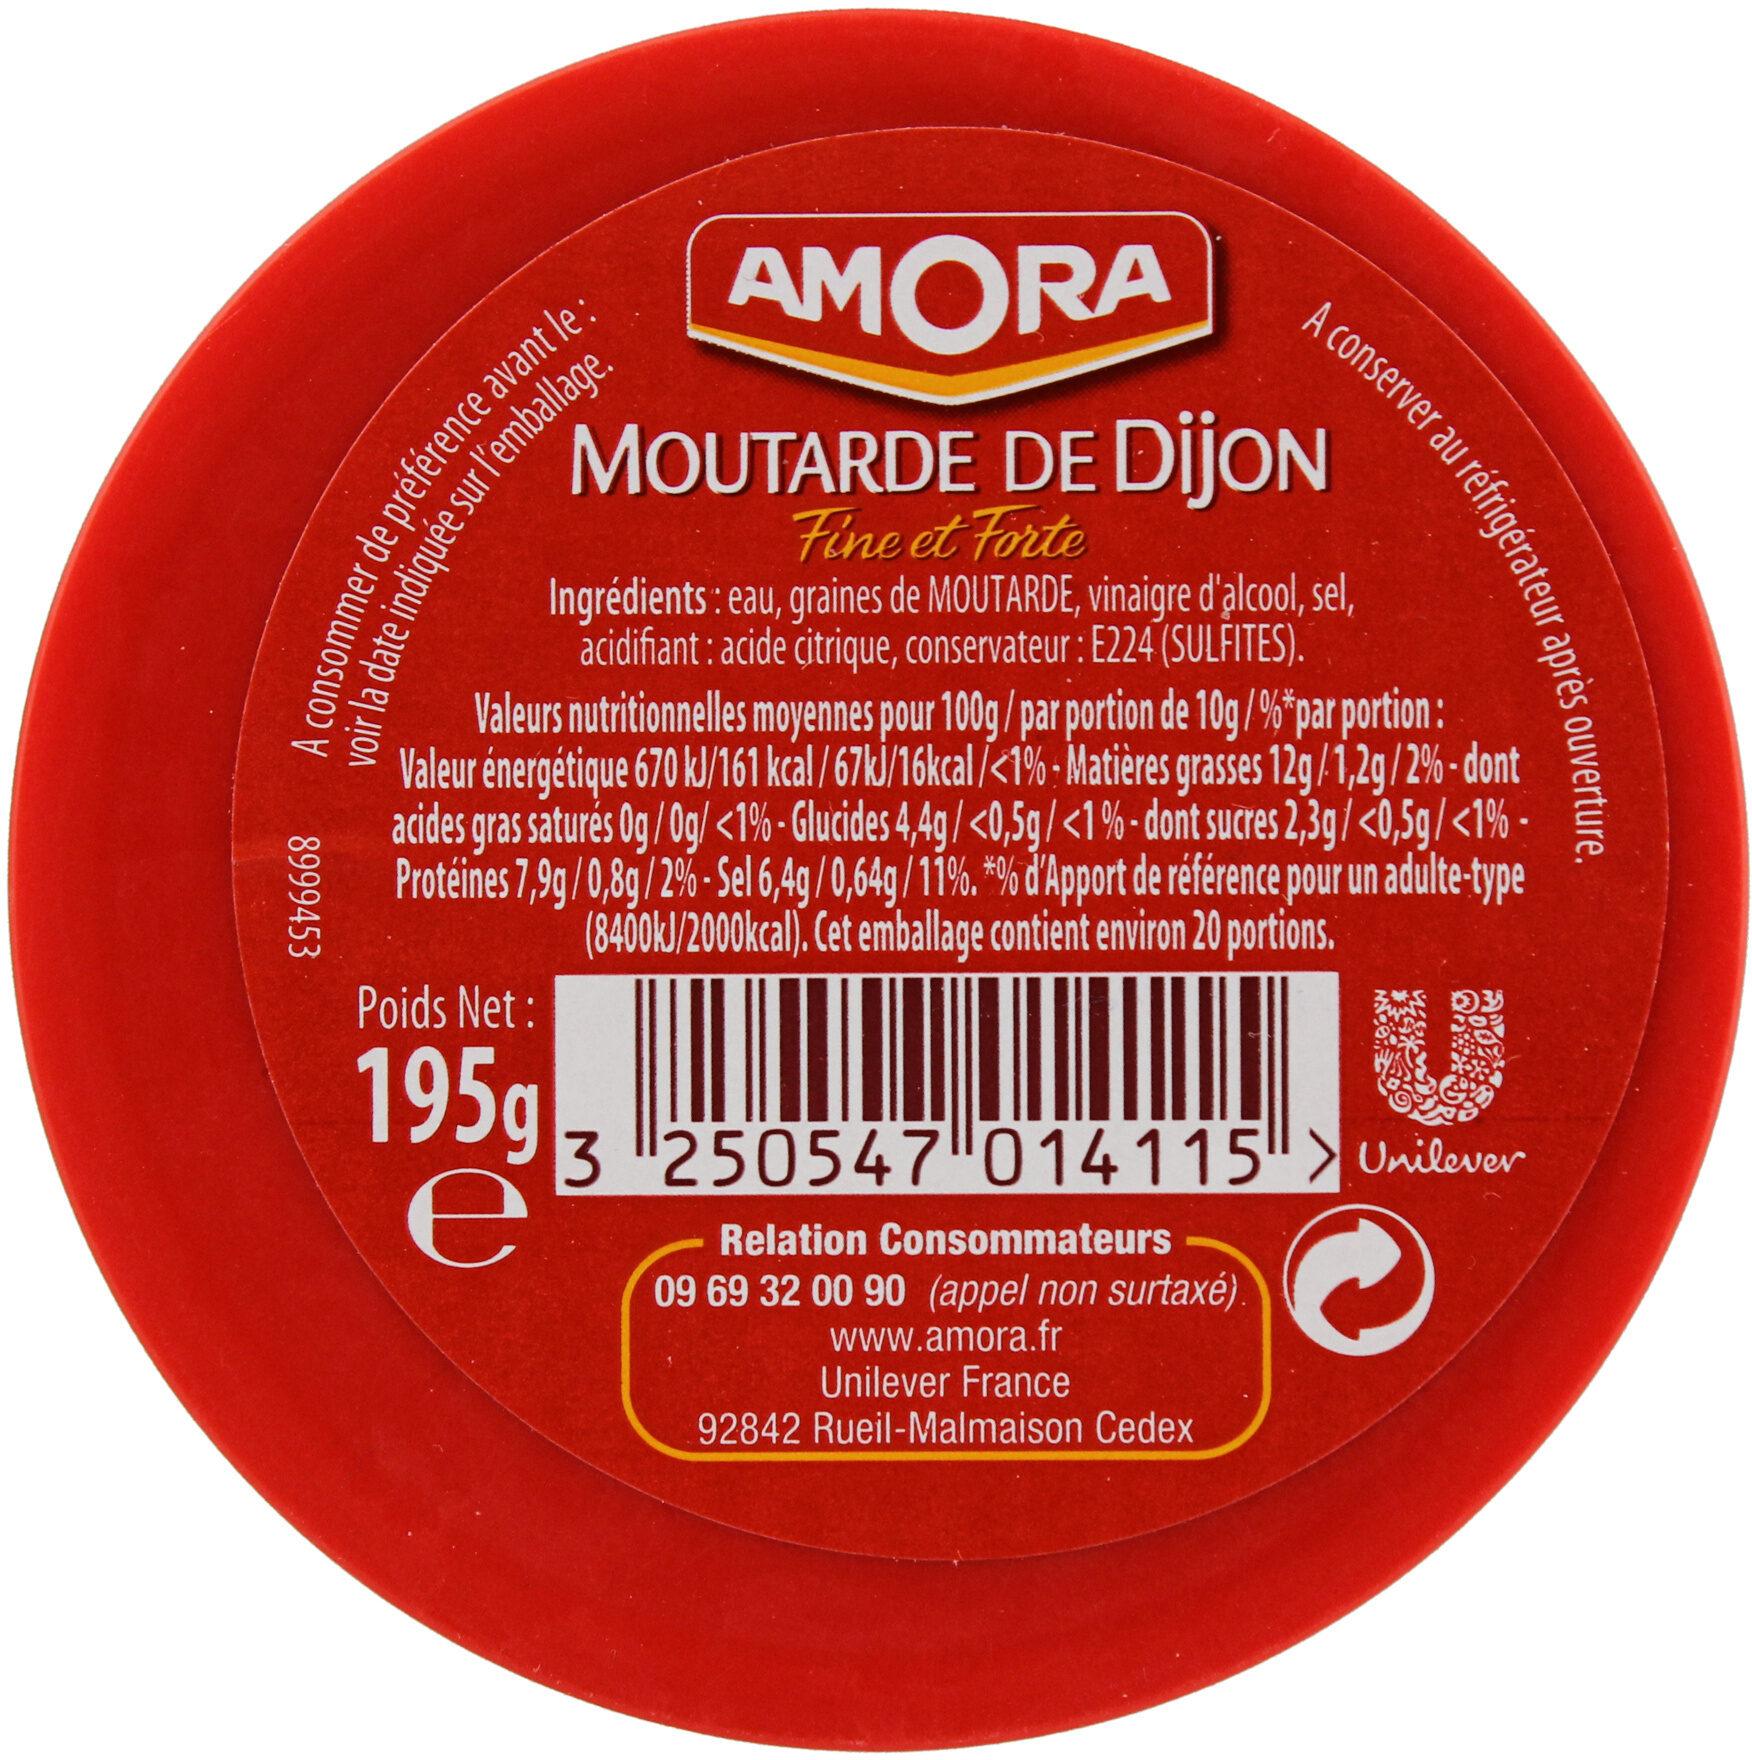 Amora Moutarde de Dijon Fine et Forte Verre Tv 195g - Informations nutritionnelles - fr